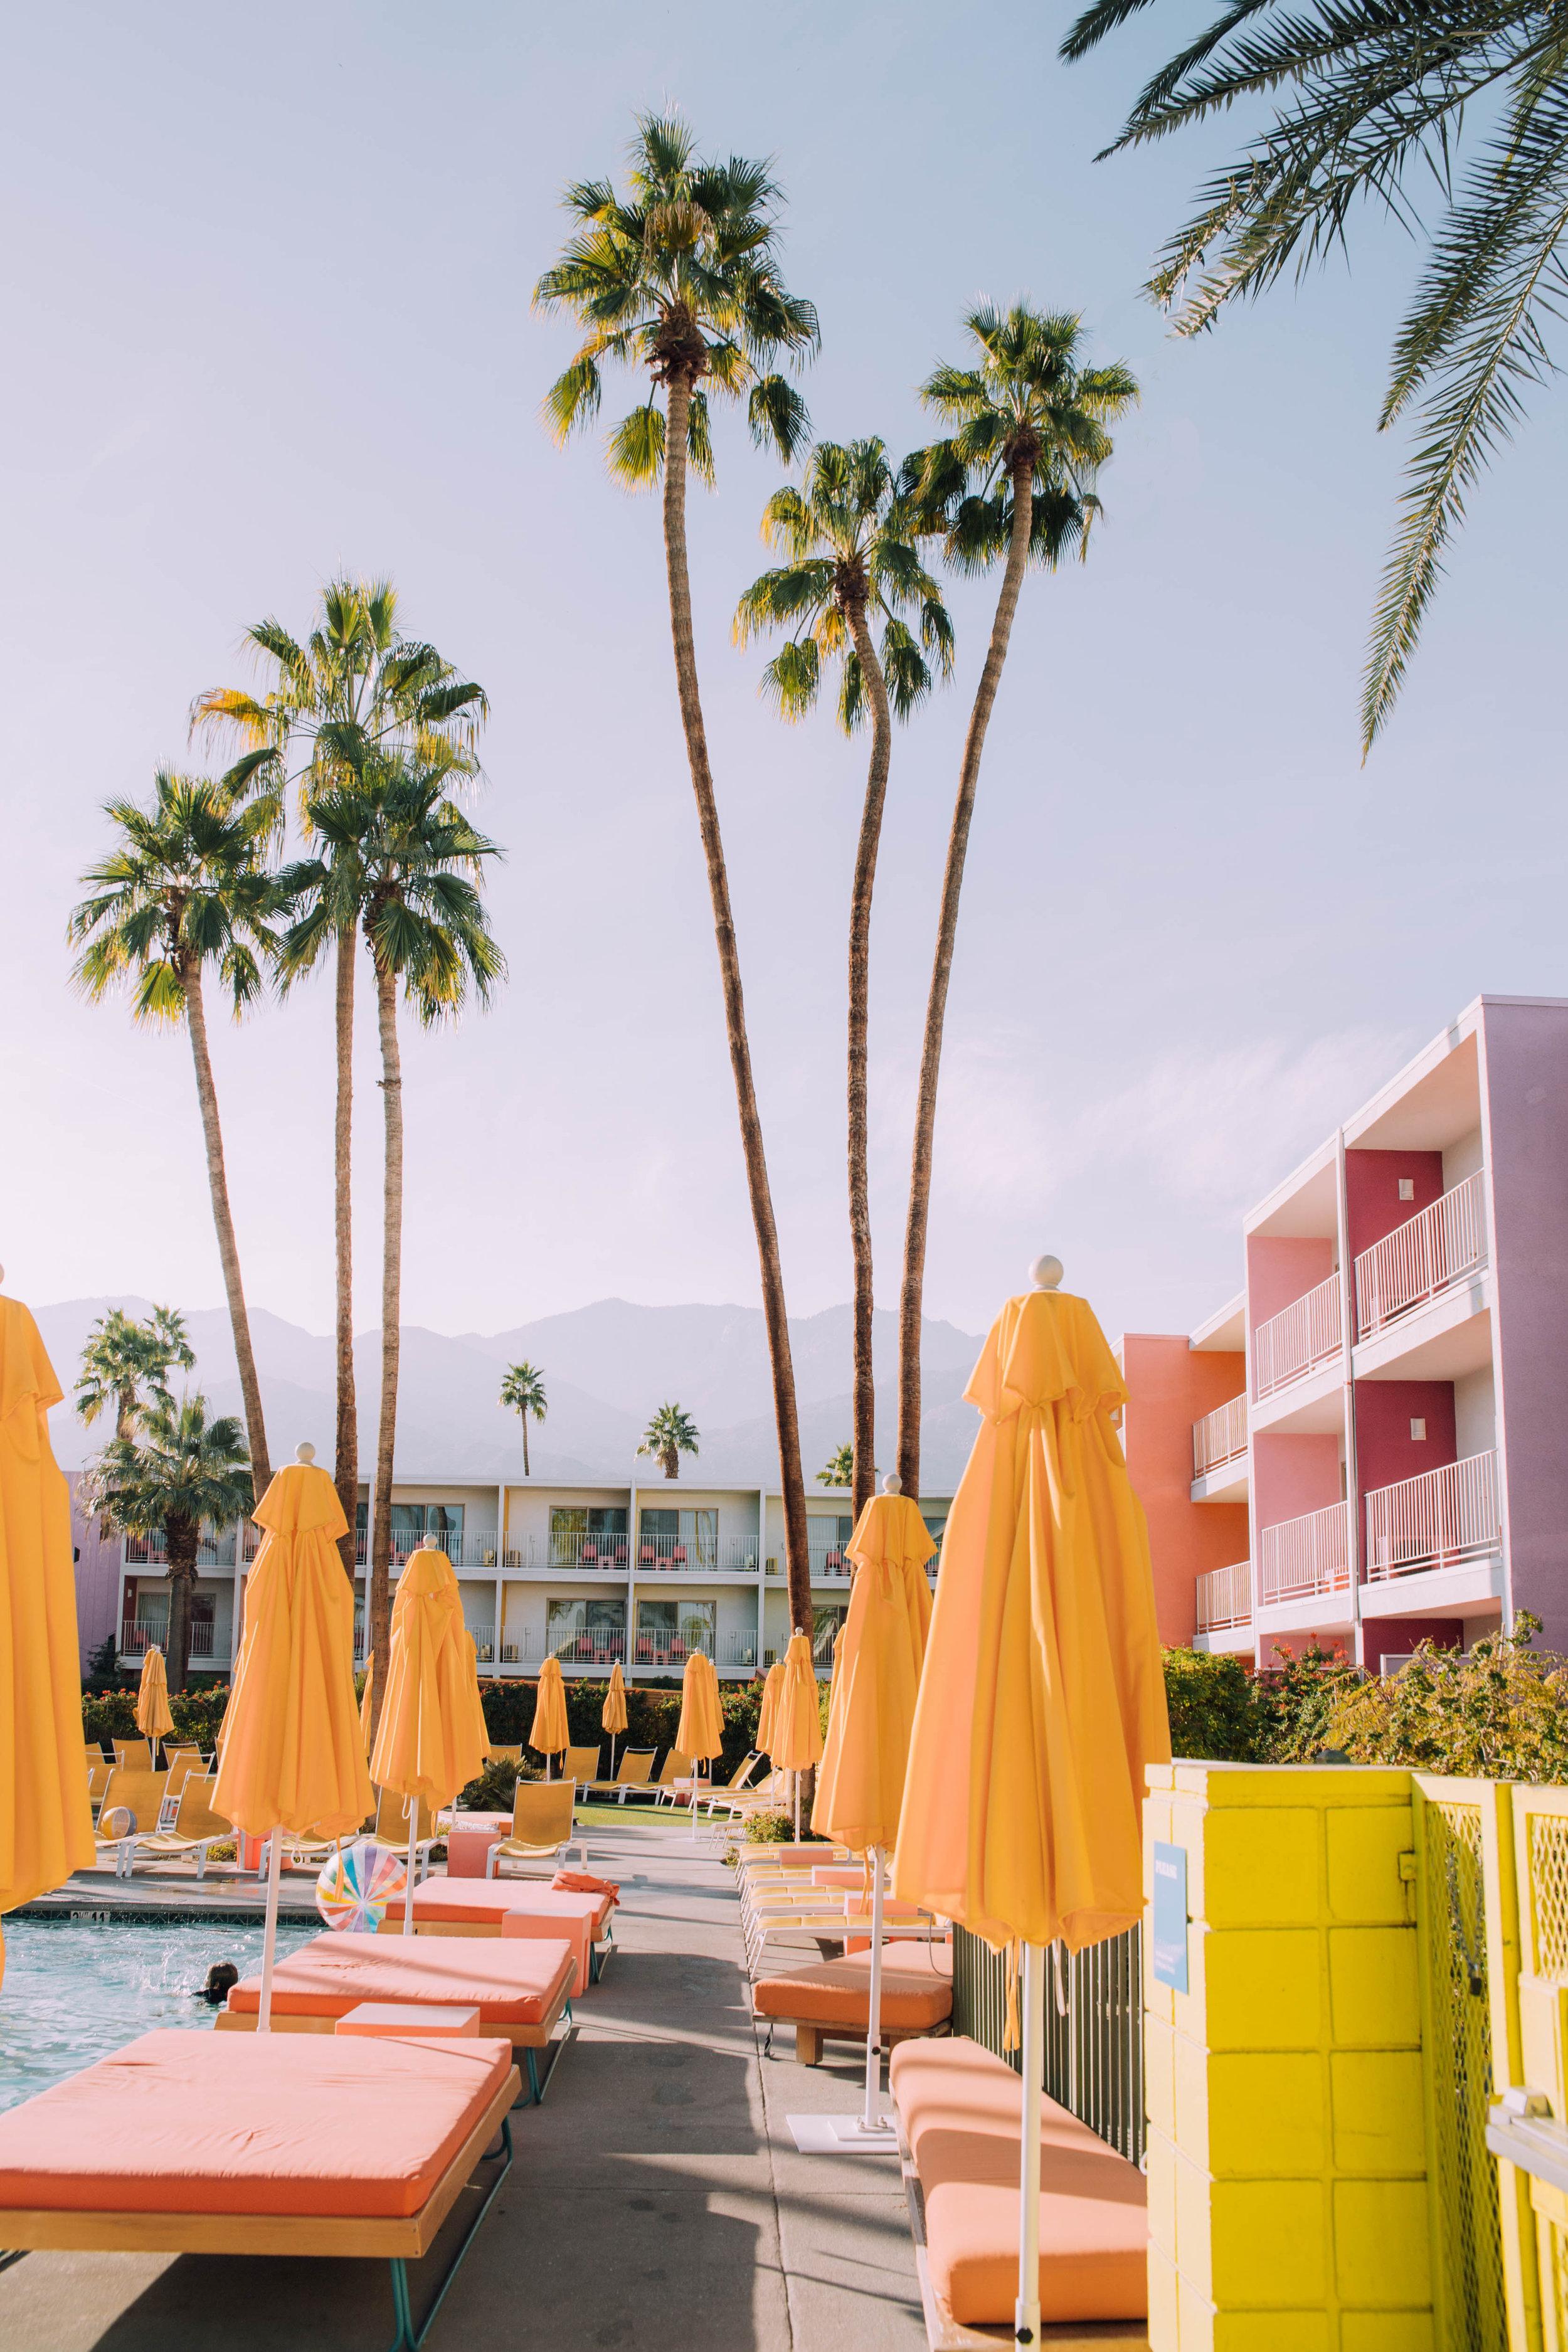 The Saguaro Palms